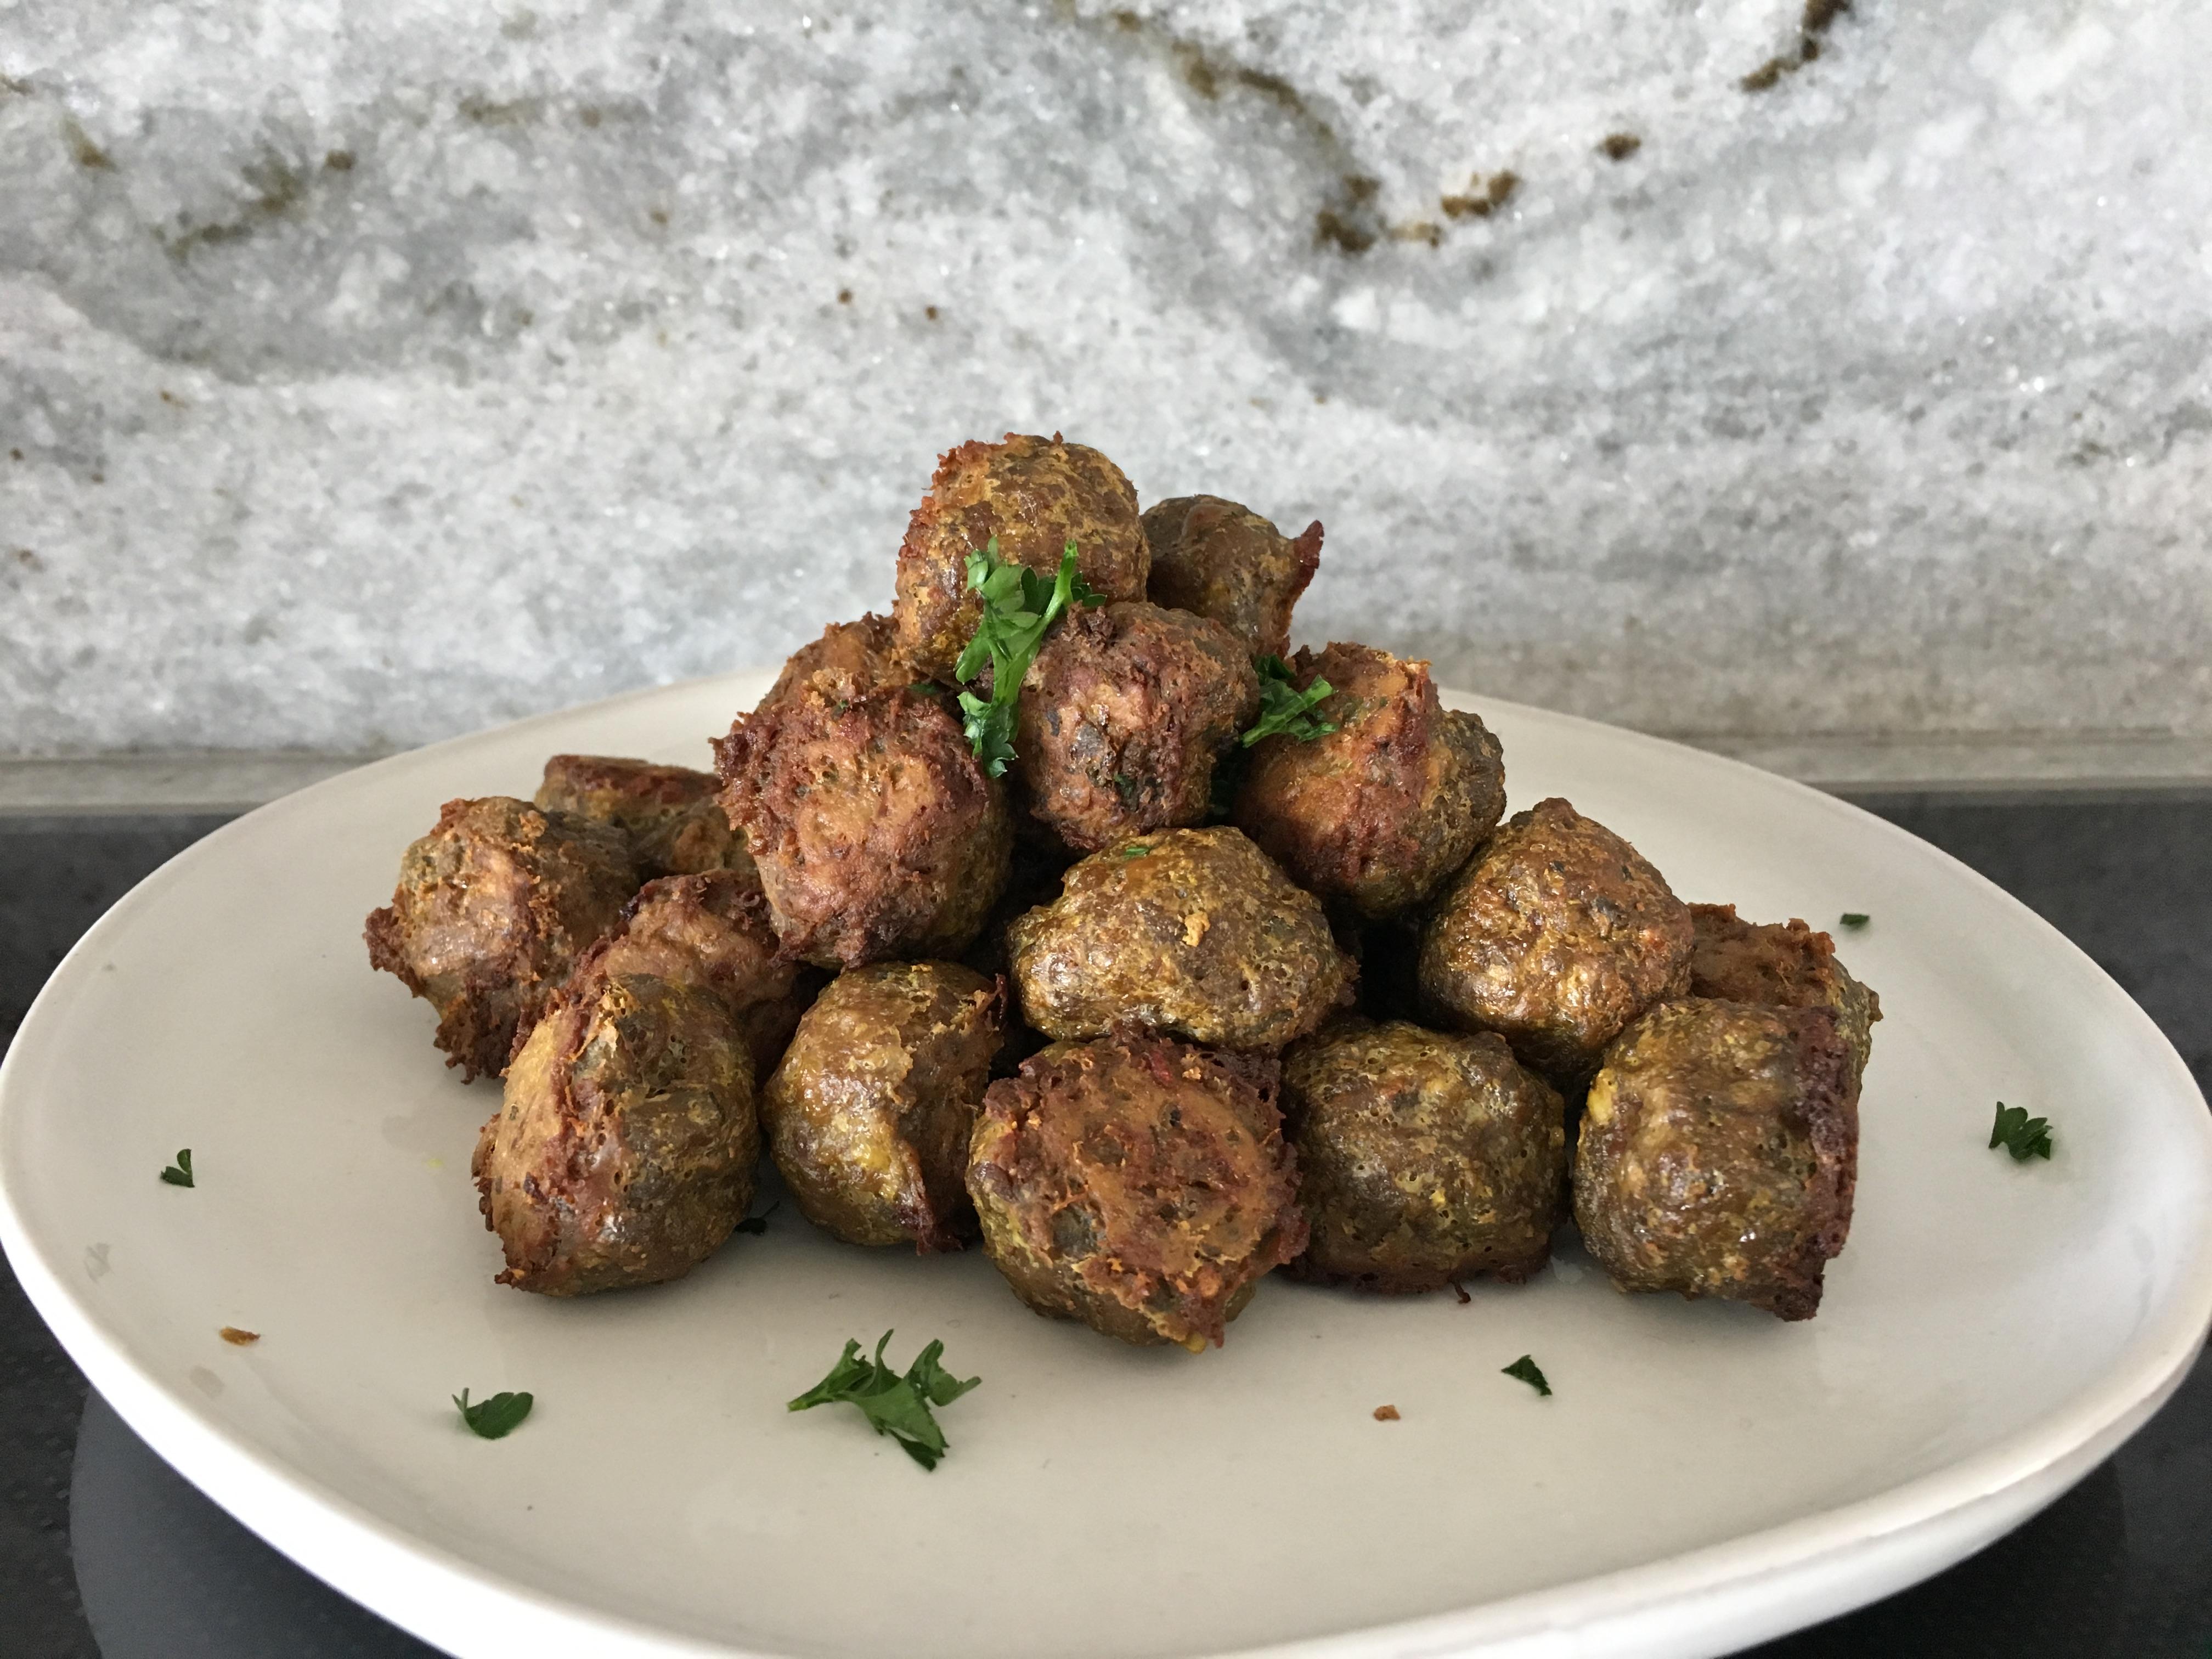 Freshly made Sheet Pan Turmeric Meatballs